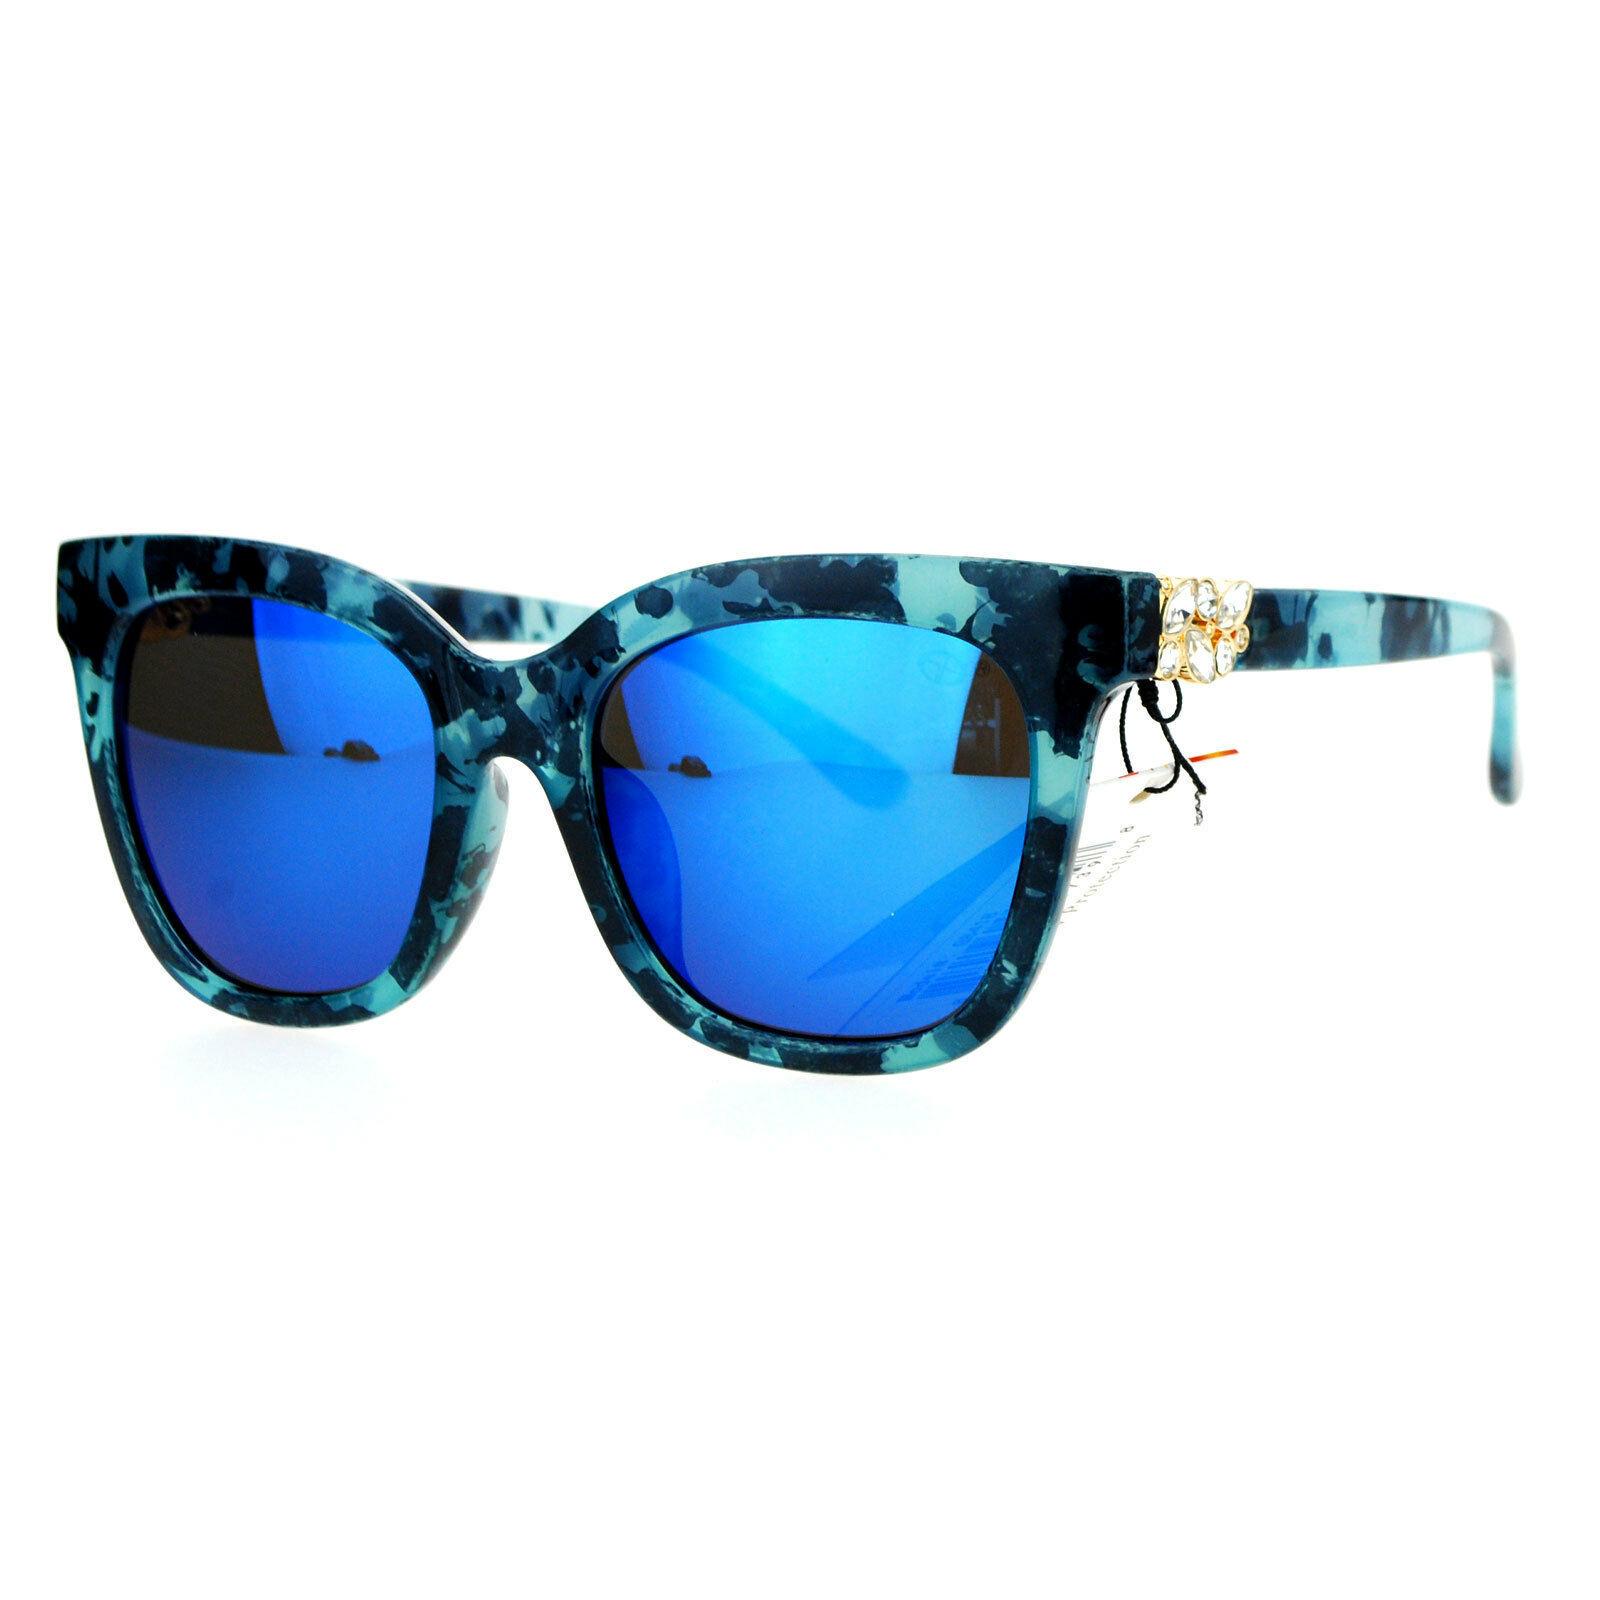 Designer Fashion Womens Sunglasses Rhinestone Accent Square Frame UV 400